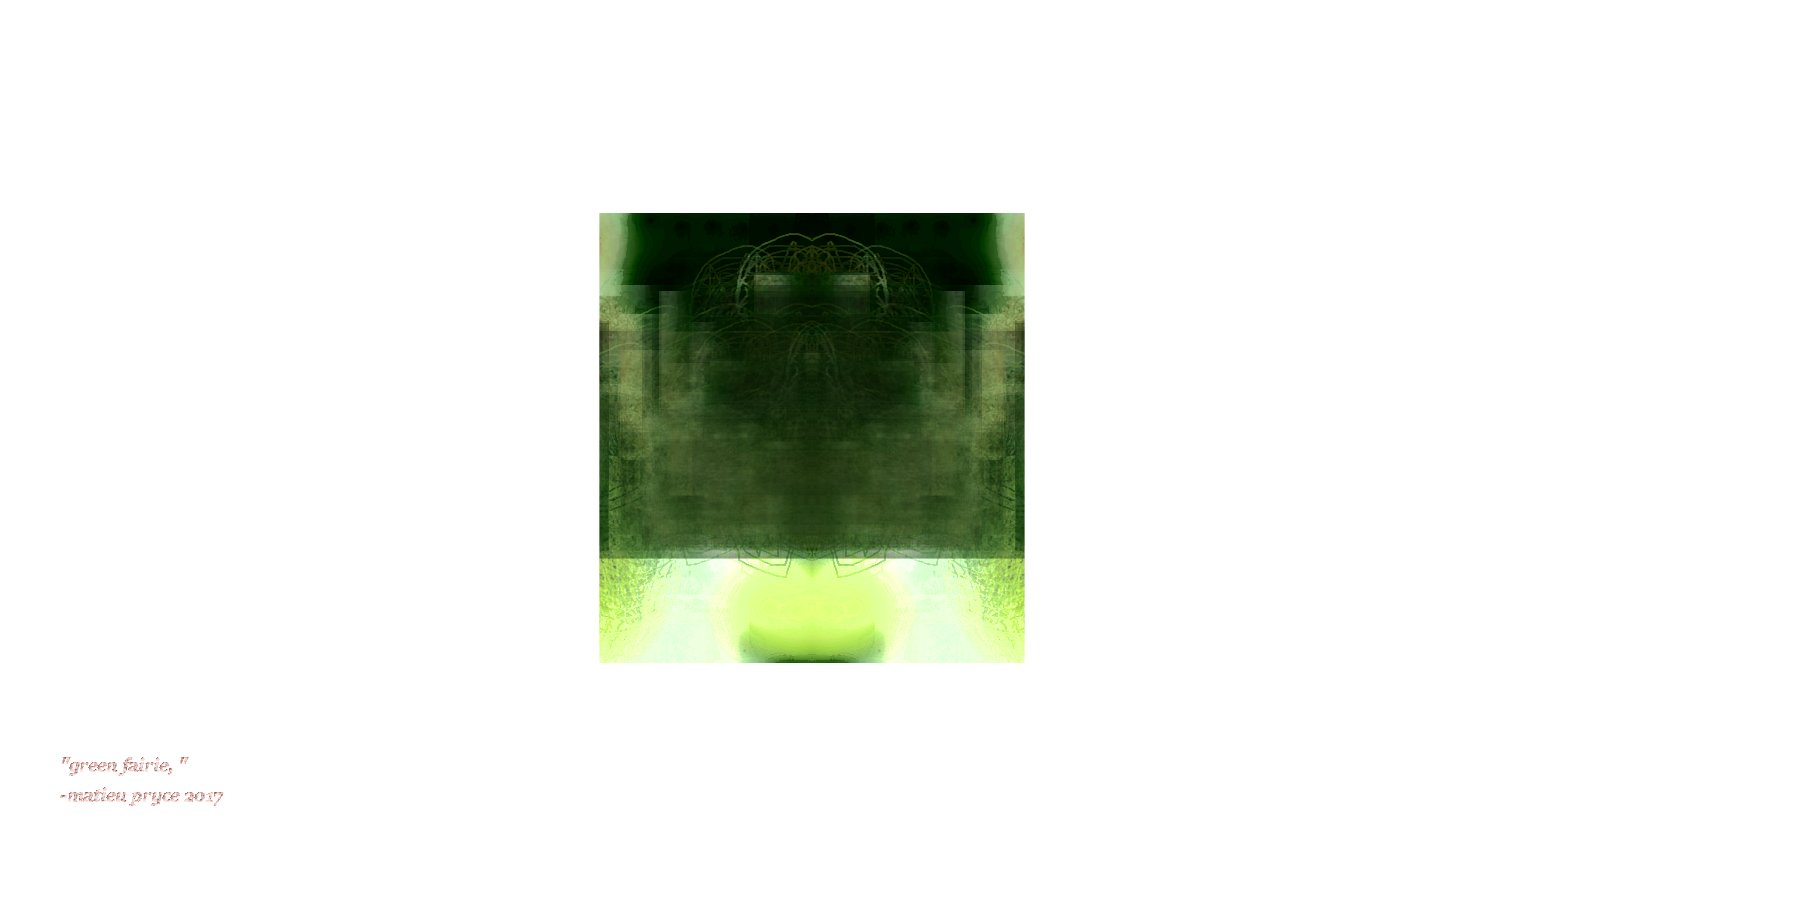 greenF